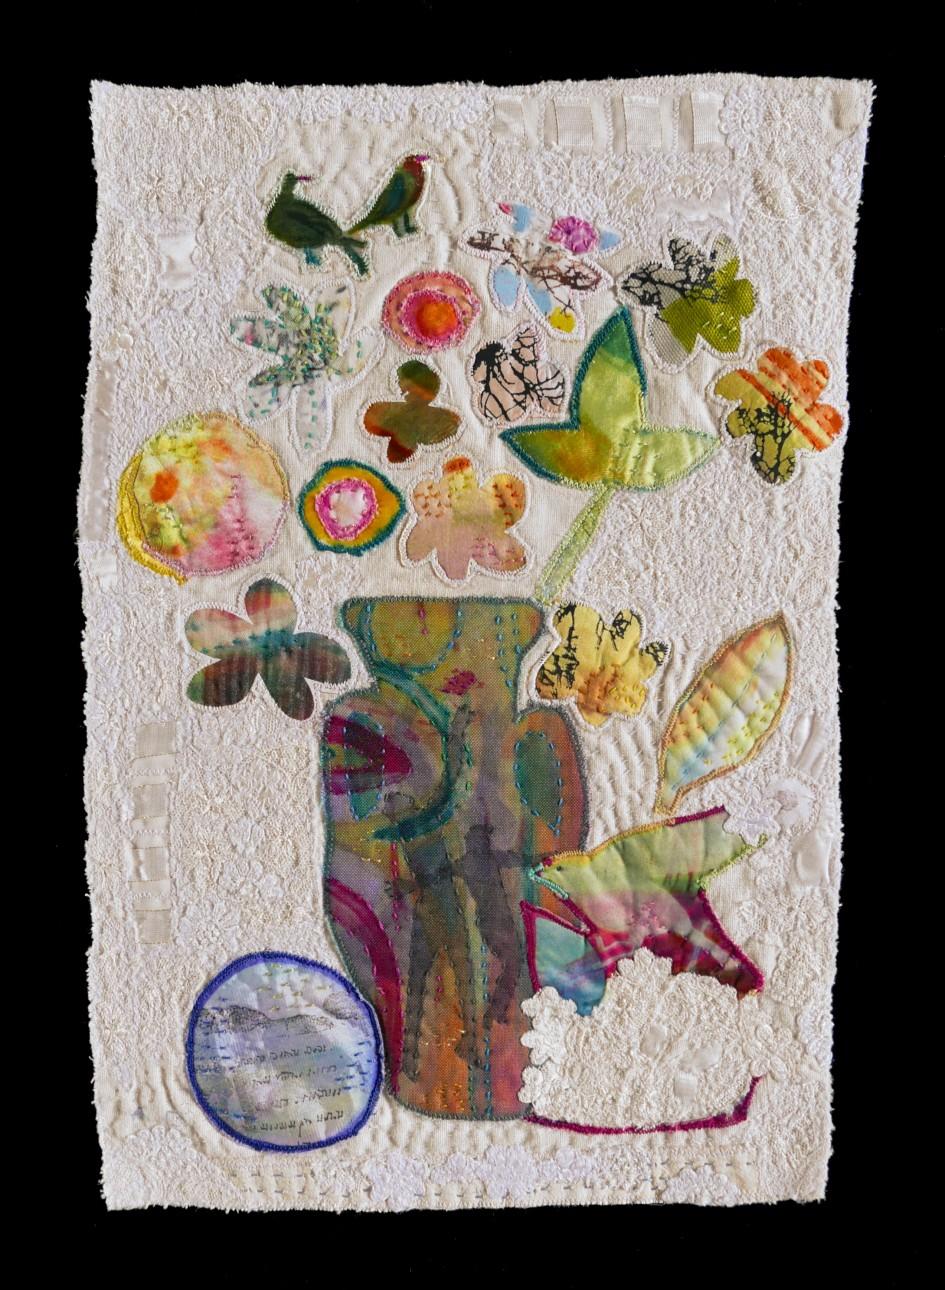 Pleasure — Textile Collage / 37 x 25 cm